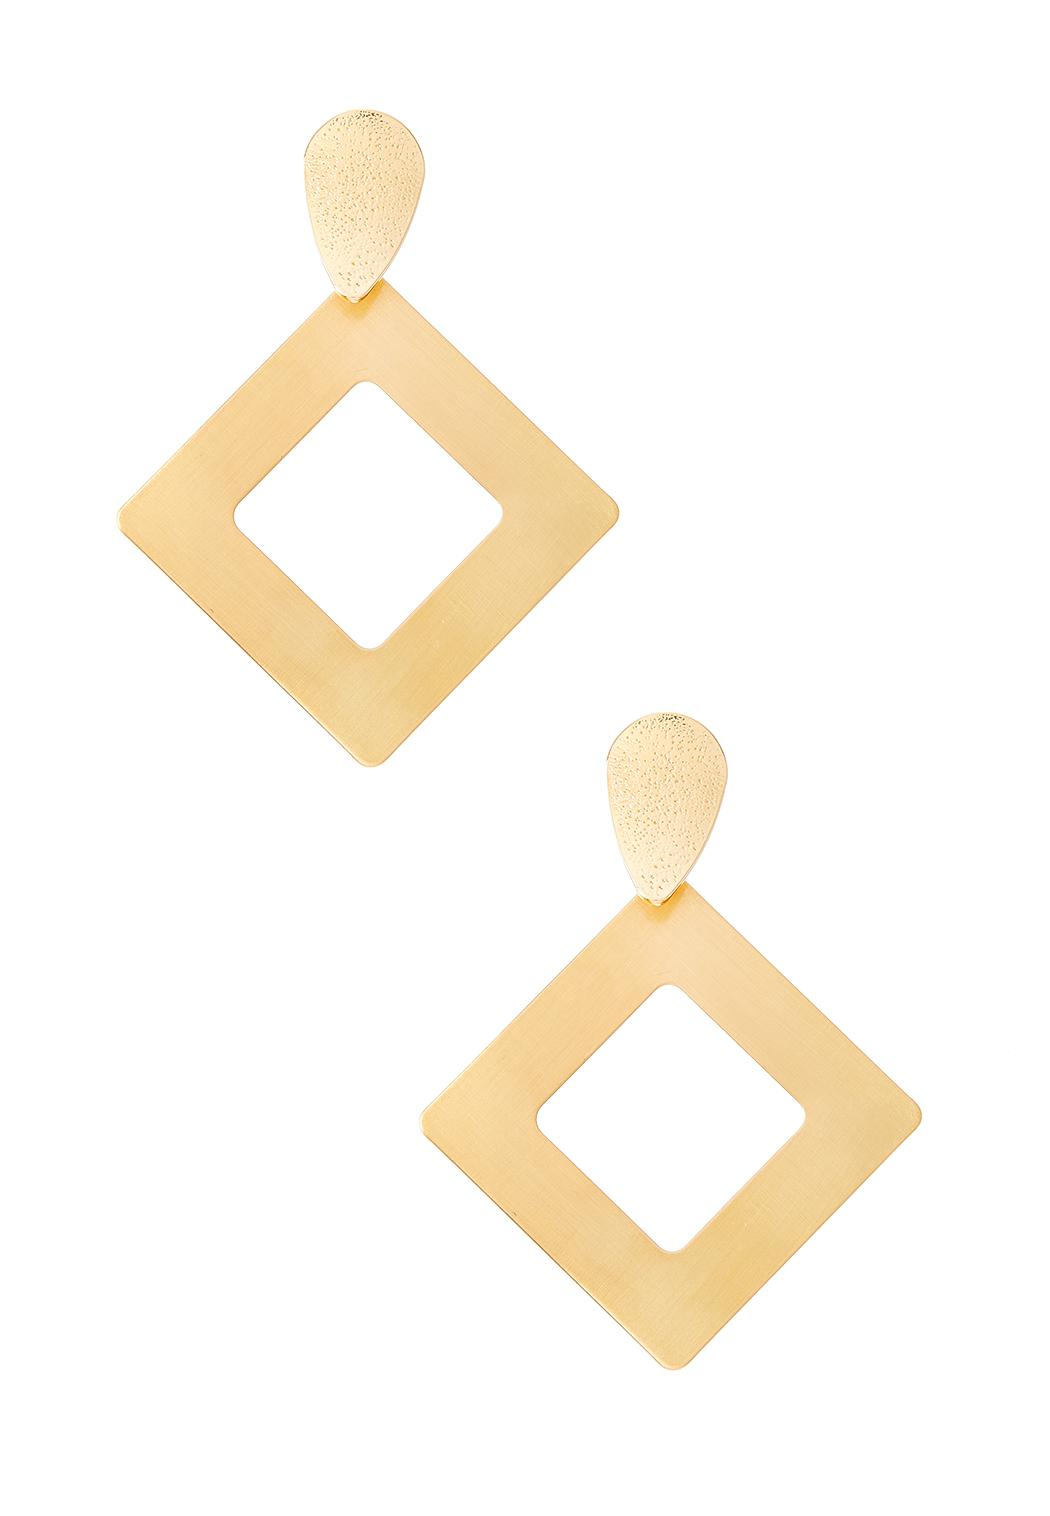 Brushed Gold Diamond Shaped Earrings